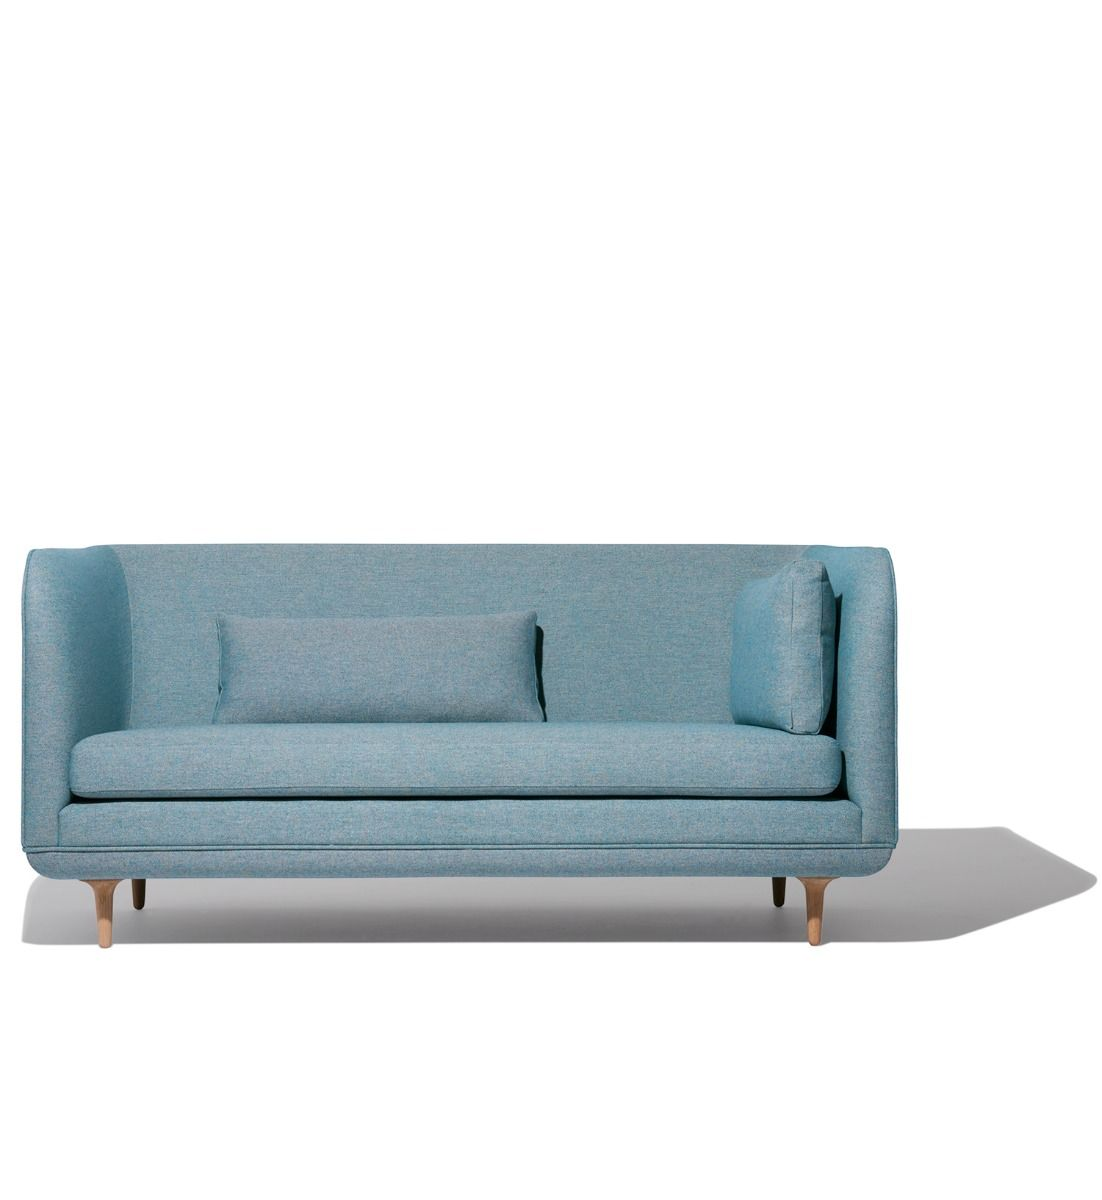 Clement Sofa Miller Wilde Home Sweet Home Sofa Sofa Furniture